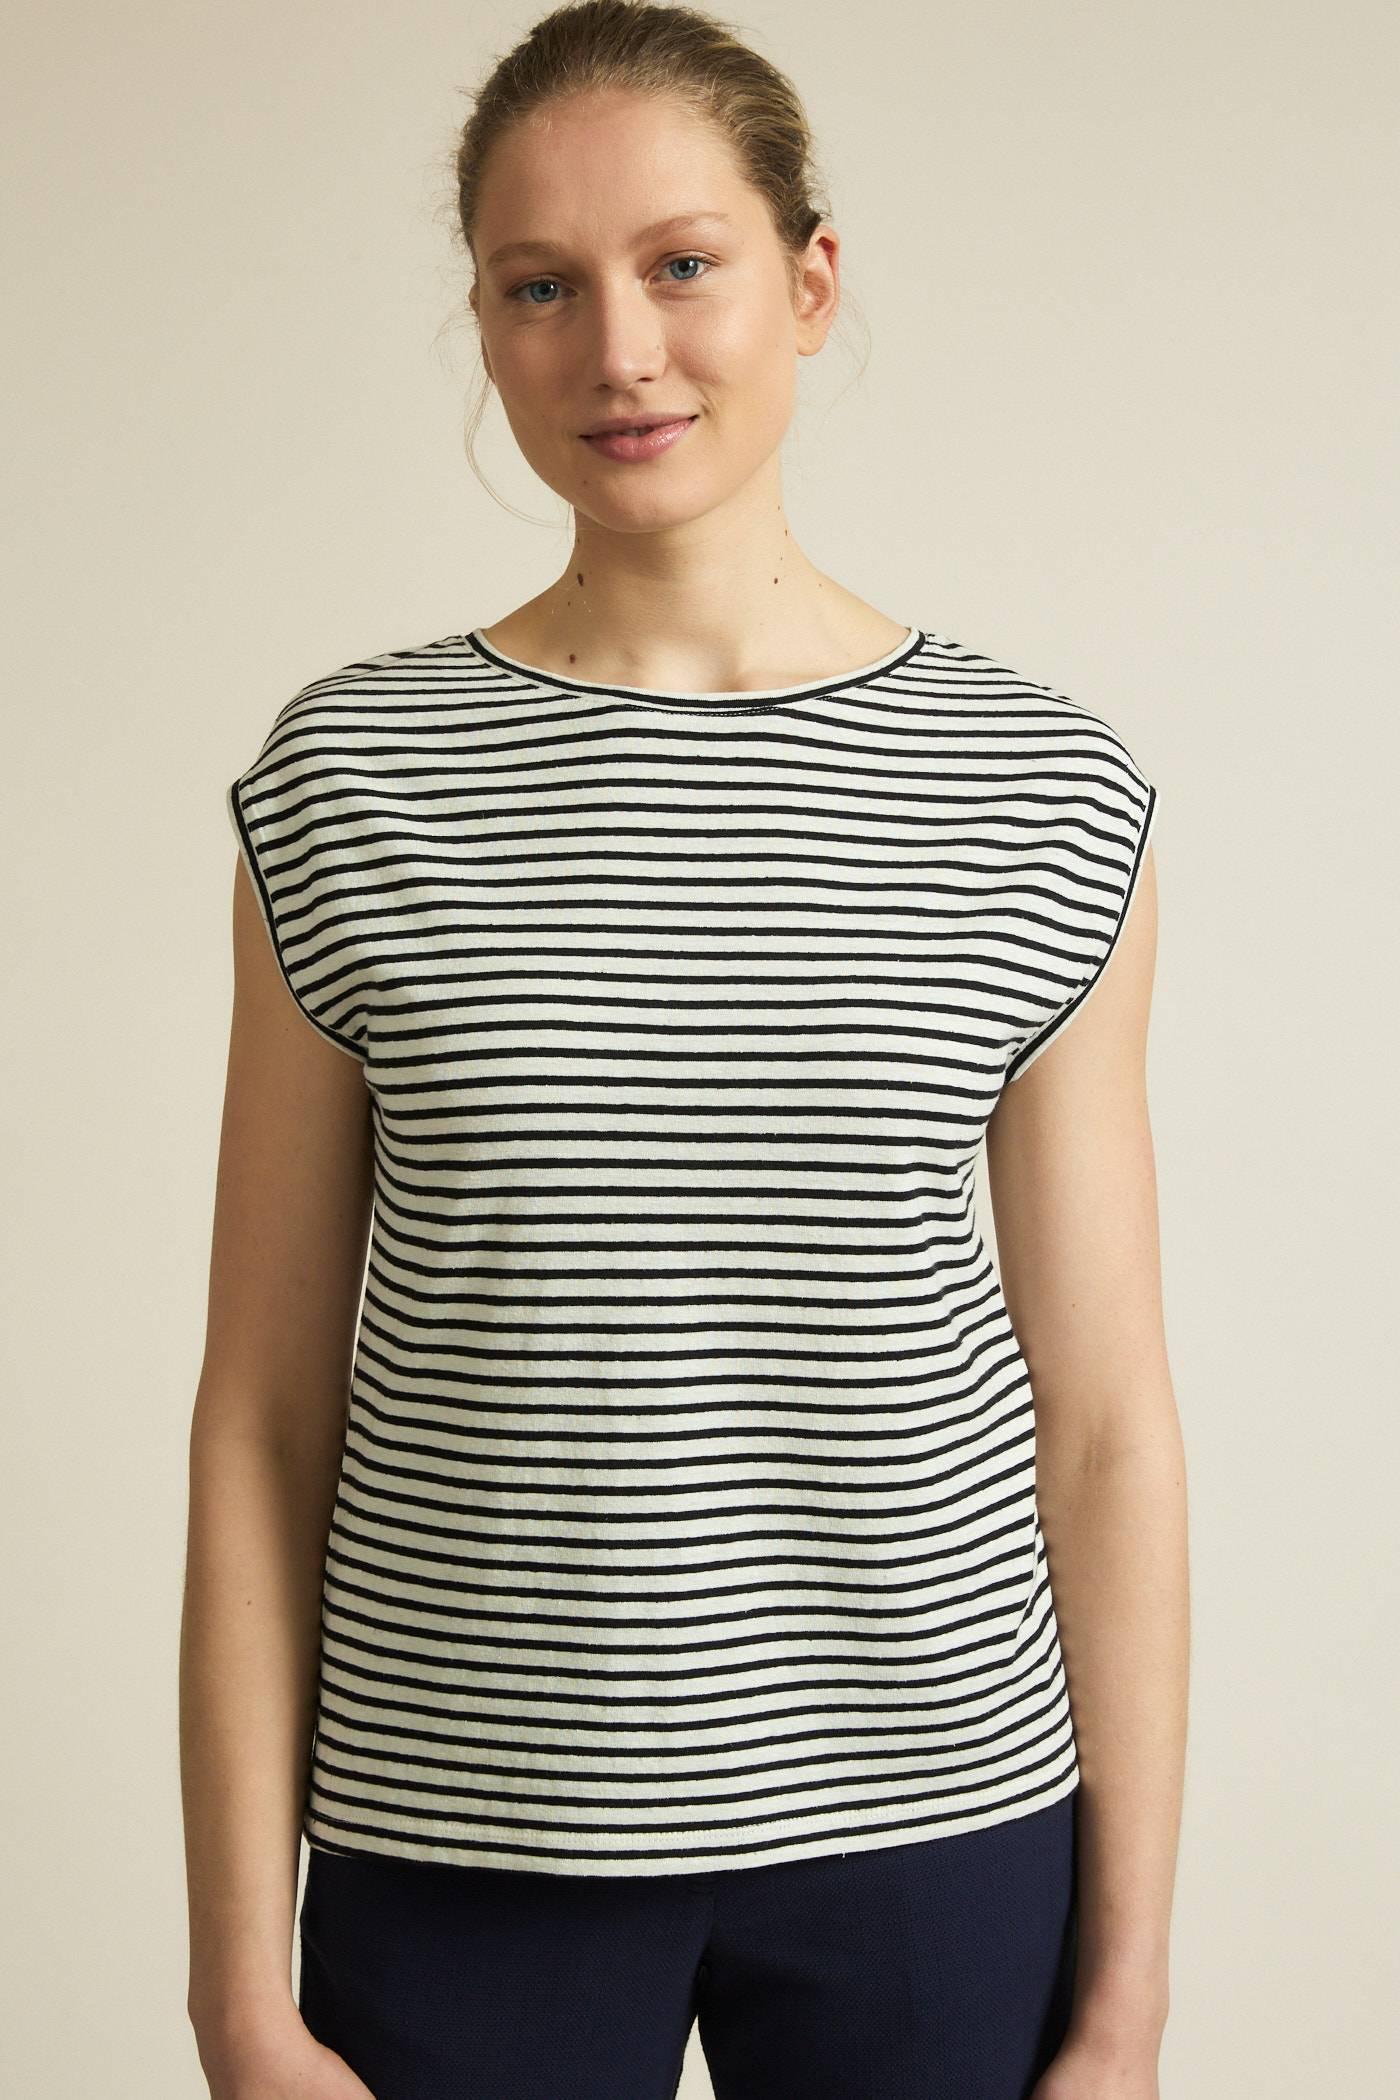 Striped shirt from LANIUS